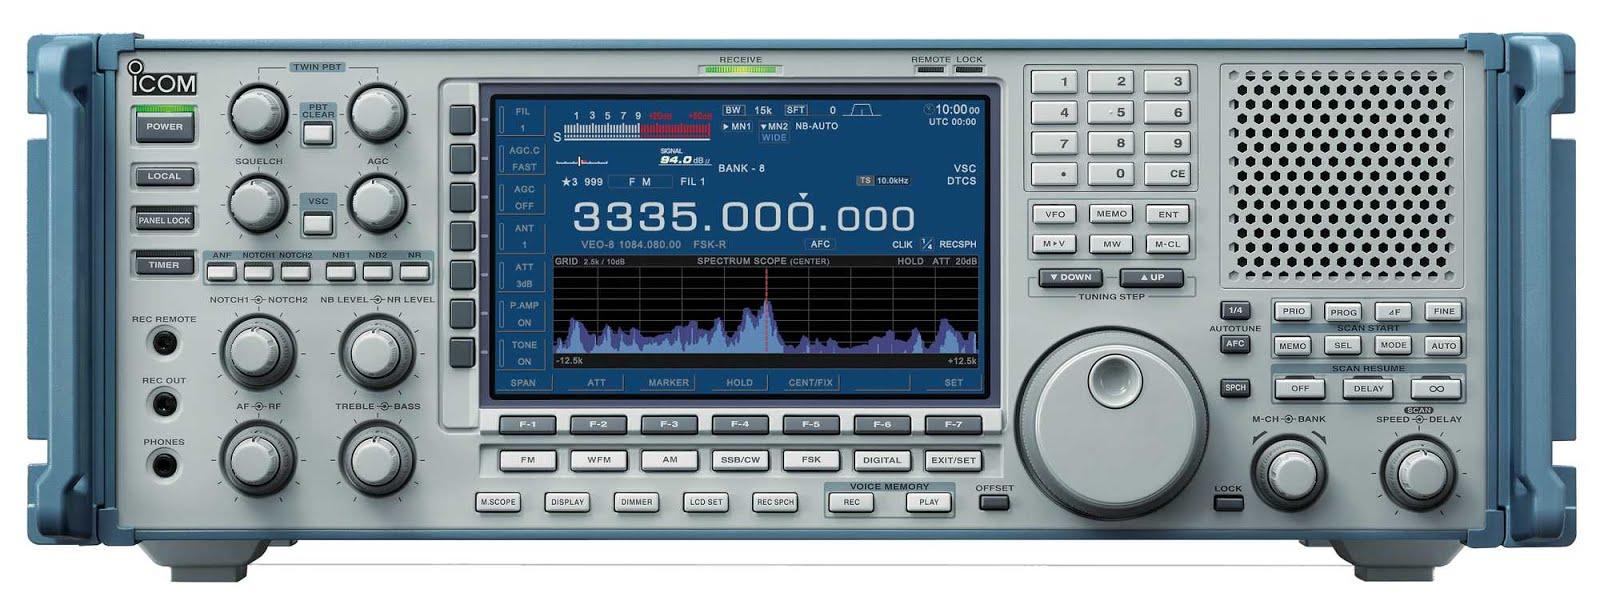 HF RADIO RECEIVER